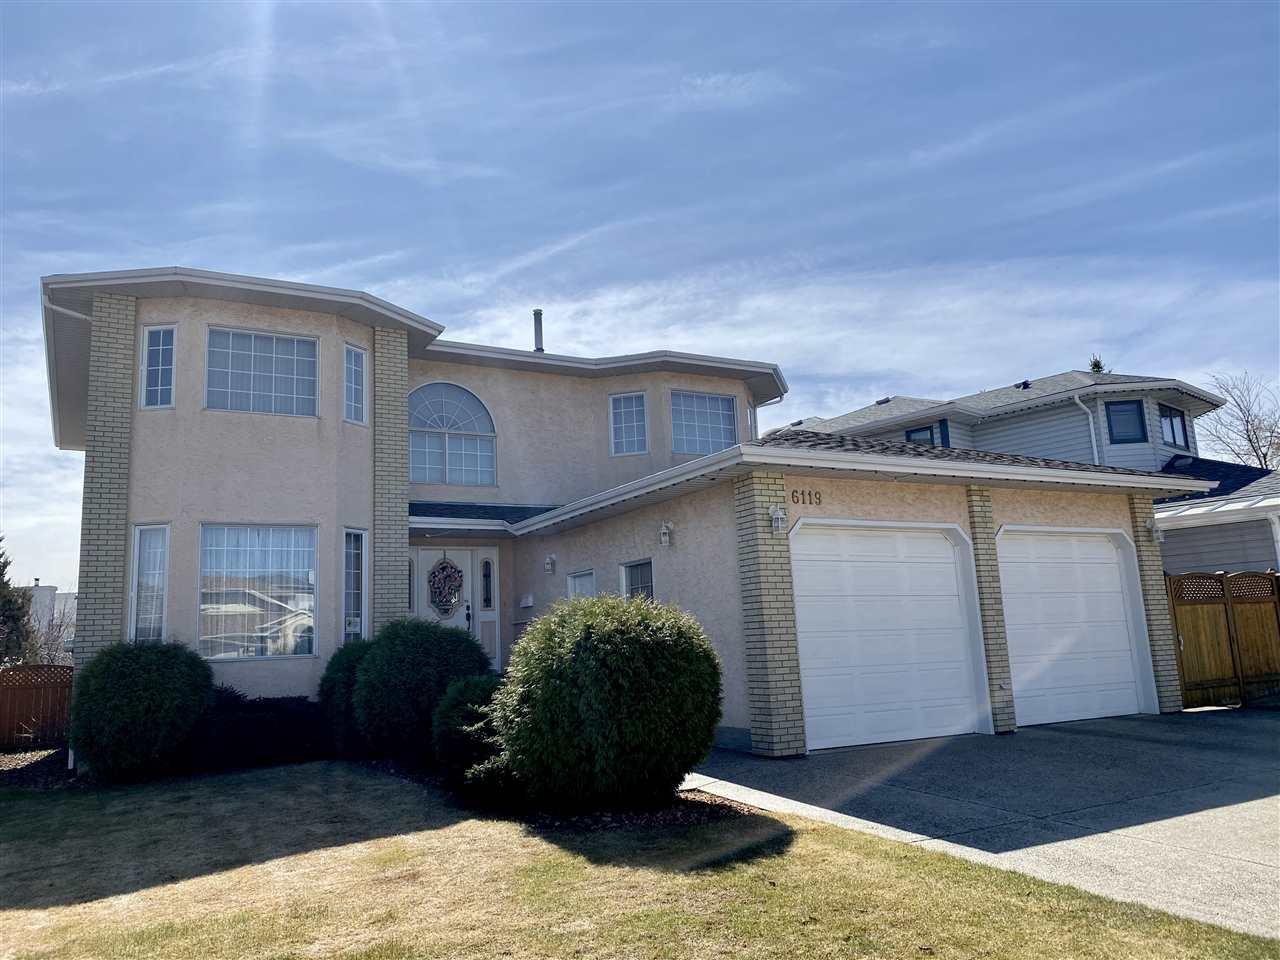 Main Photo: 6119 156 Avenue in Edmonton: Zone 03 House for sale : MLS®# E4191194